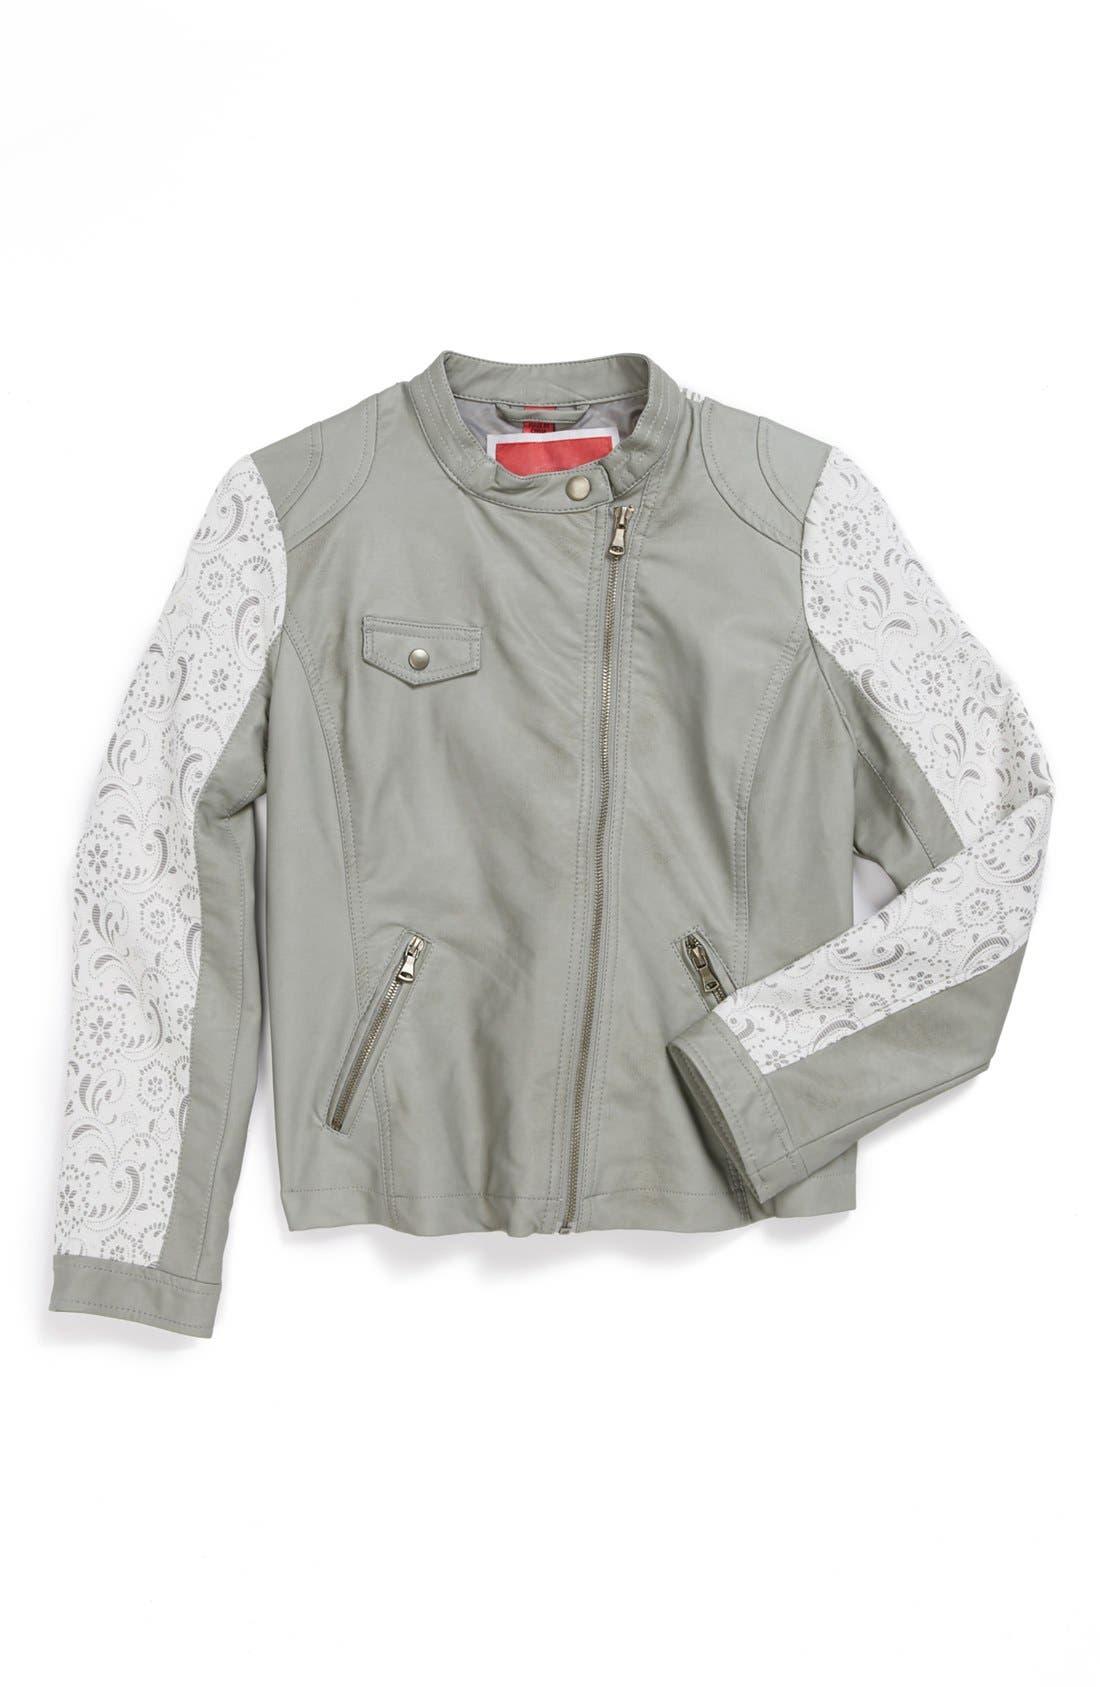 Alternate Image 1 Selected - Collection B Lace Sleeve Moto Jacket (Big Girls)